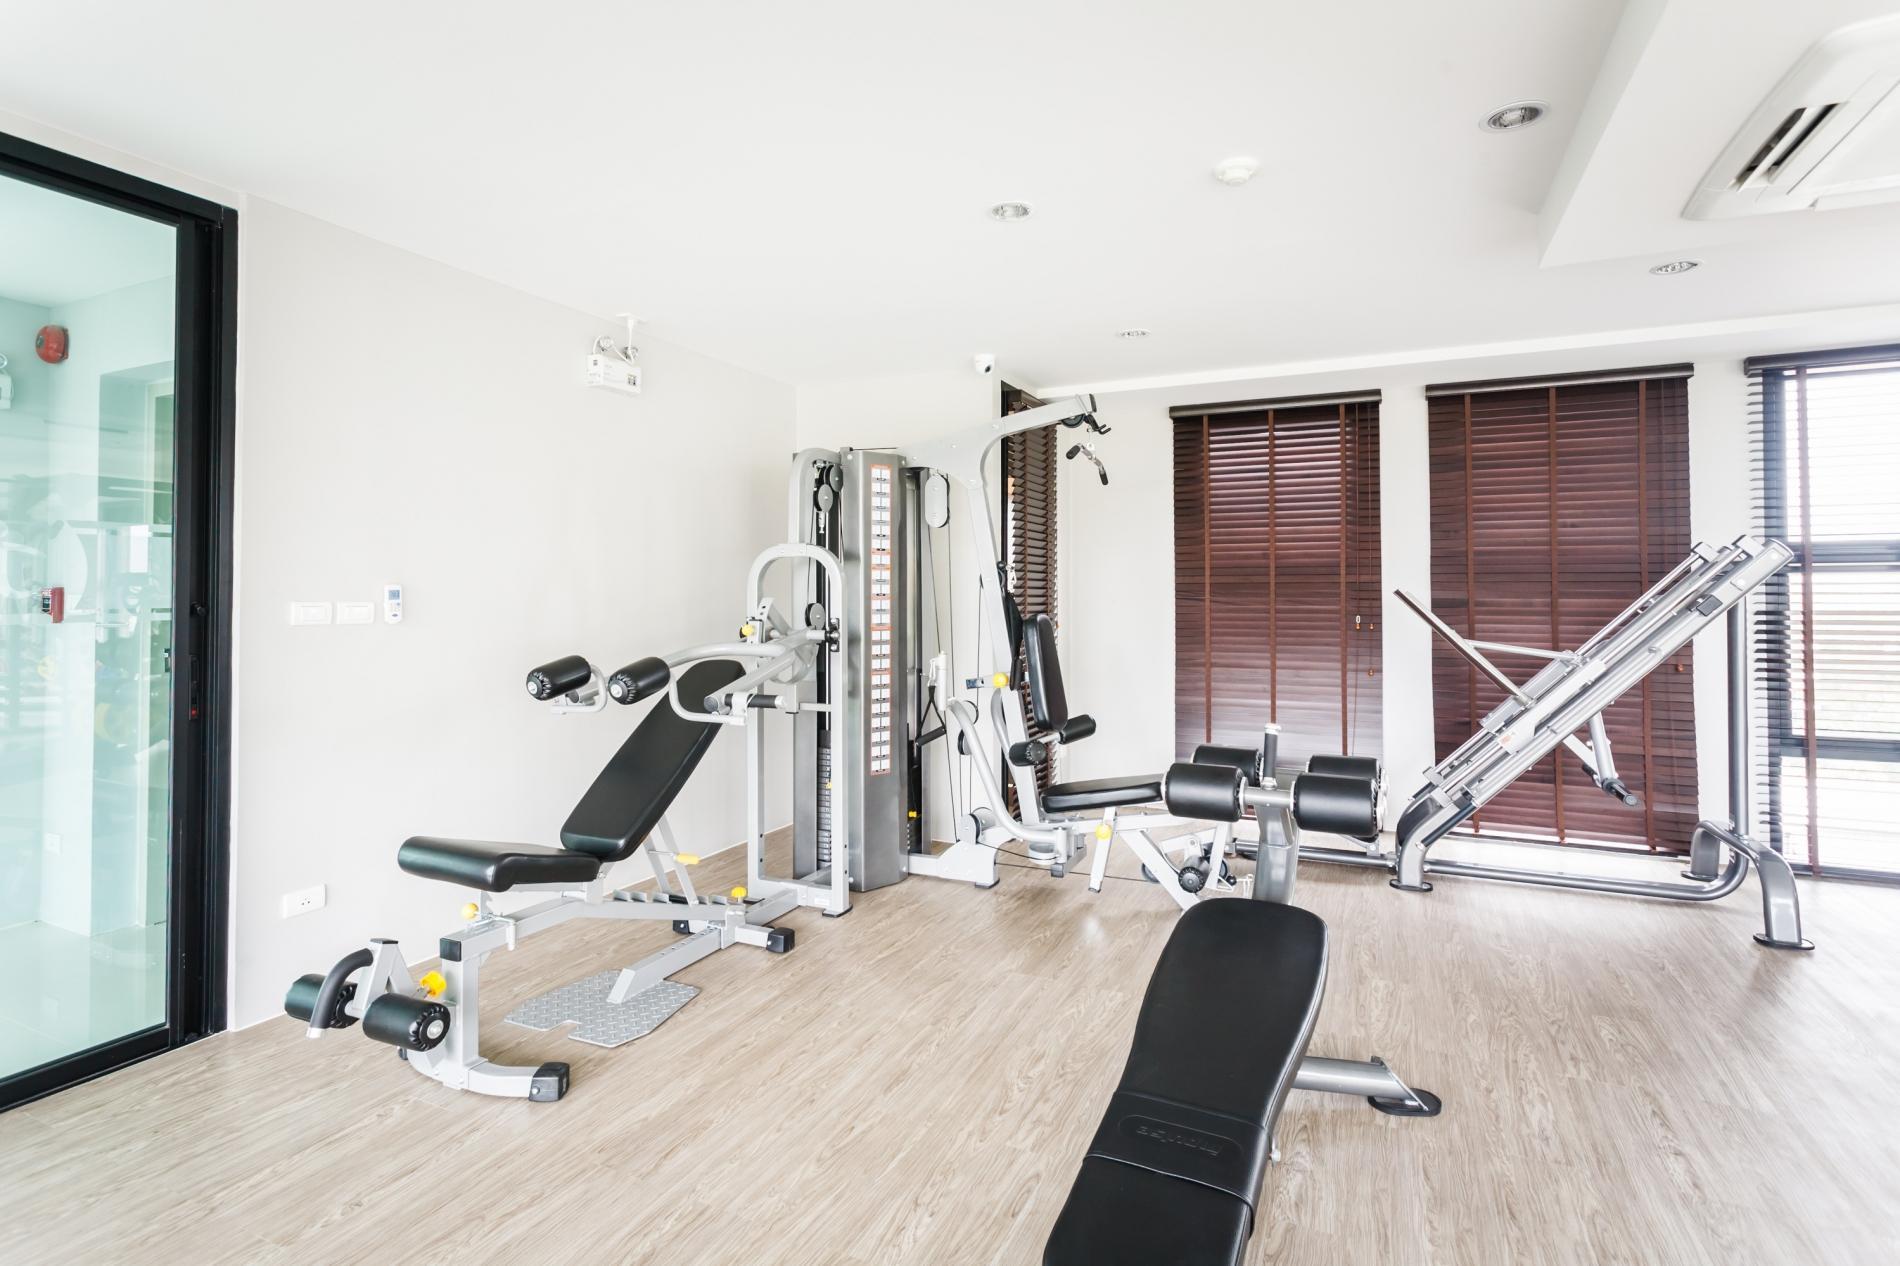 6Av 218 - Surin beach studio, pool and gym photo 15914258